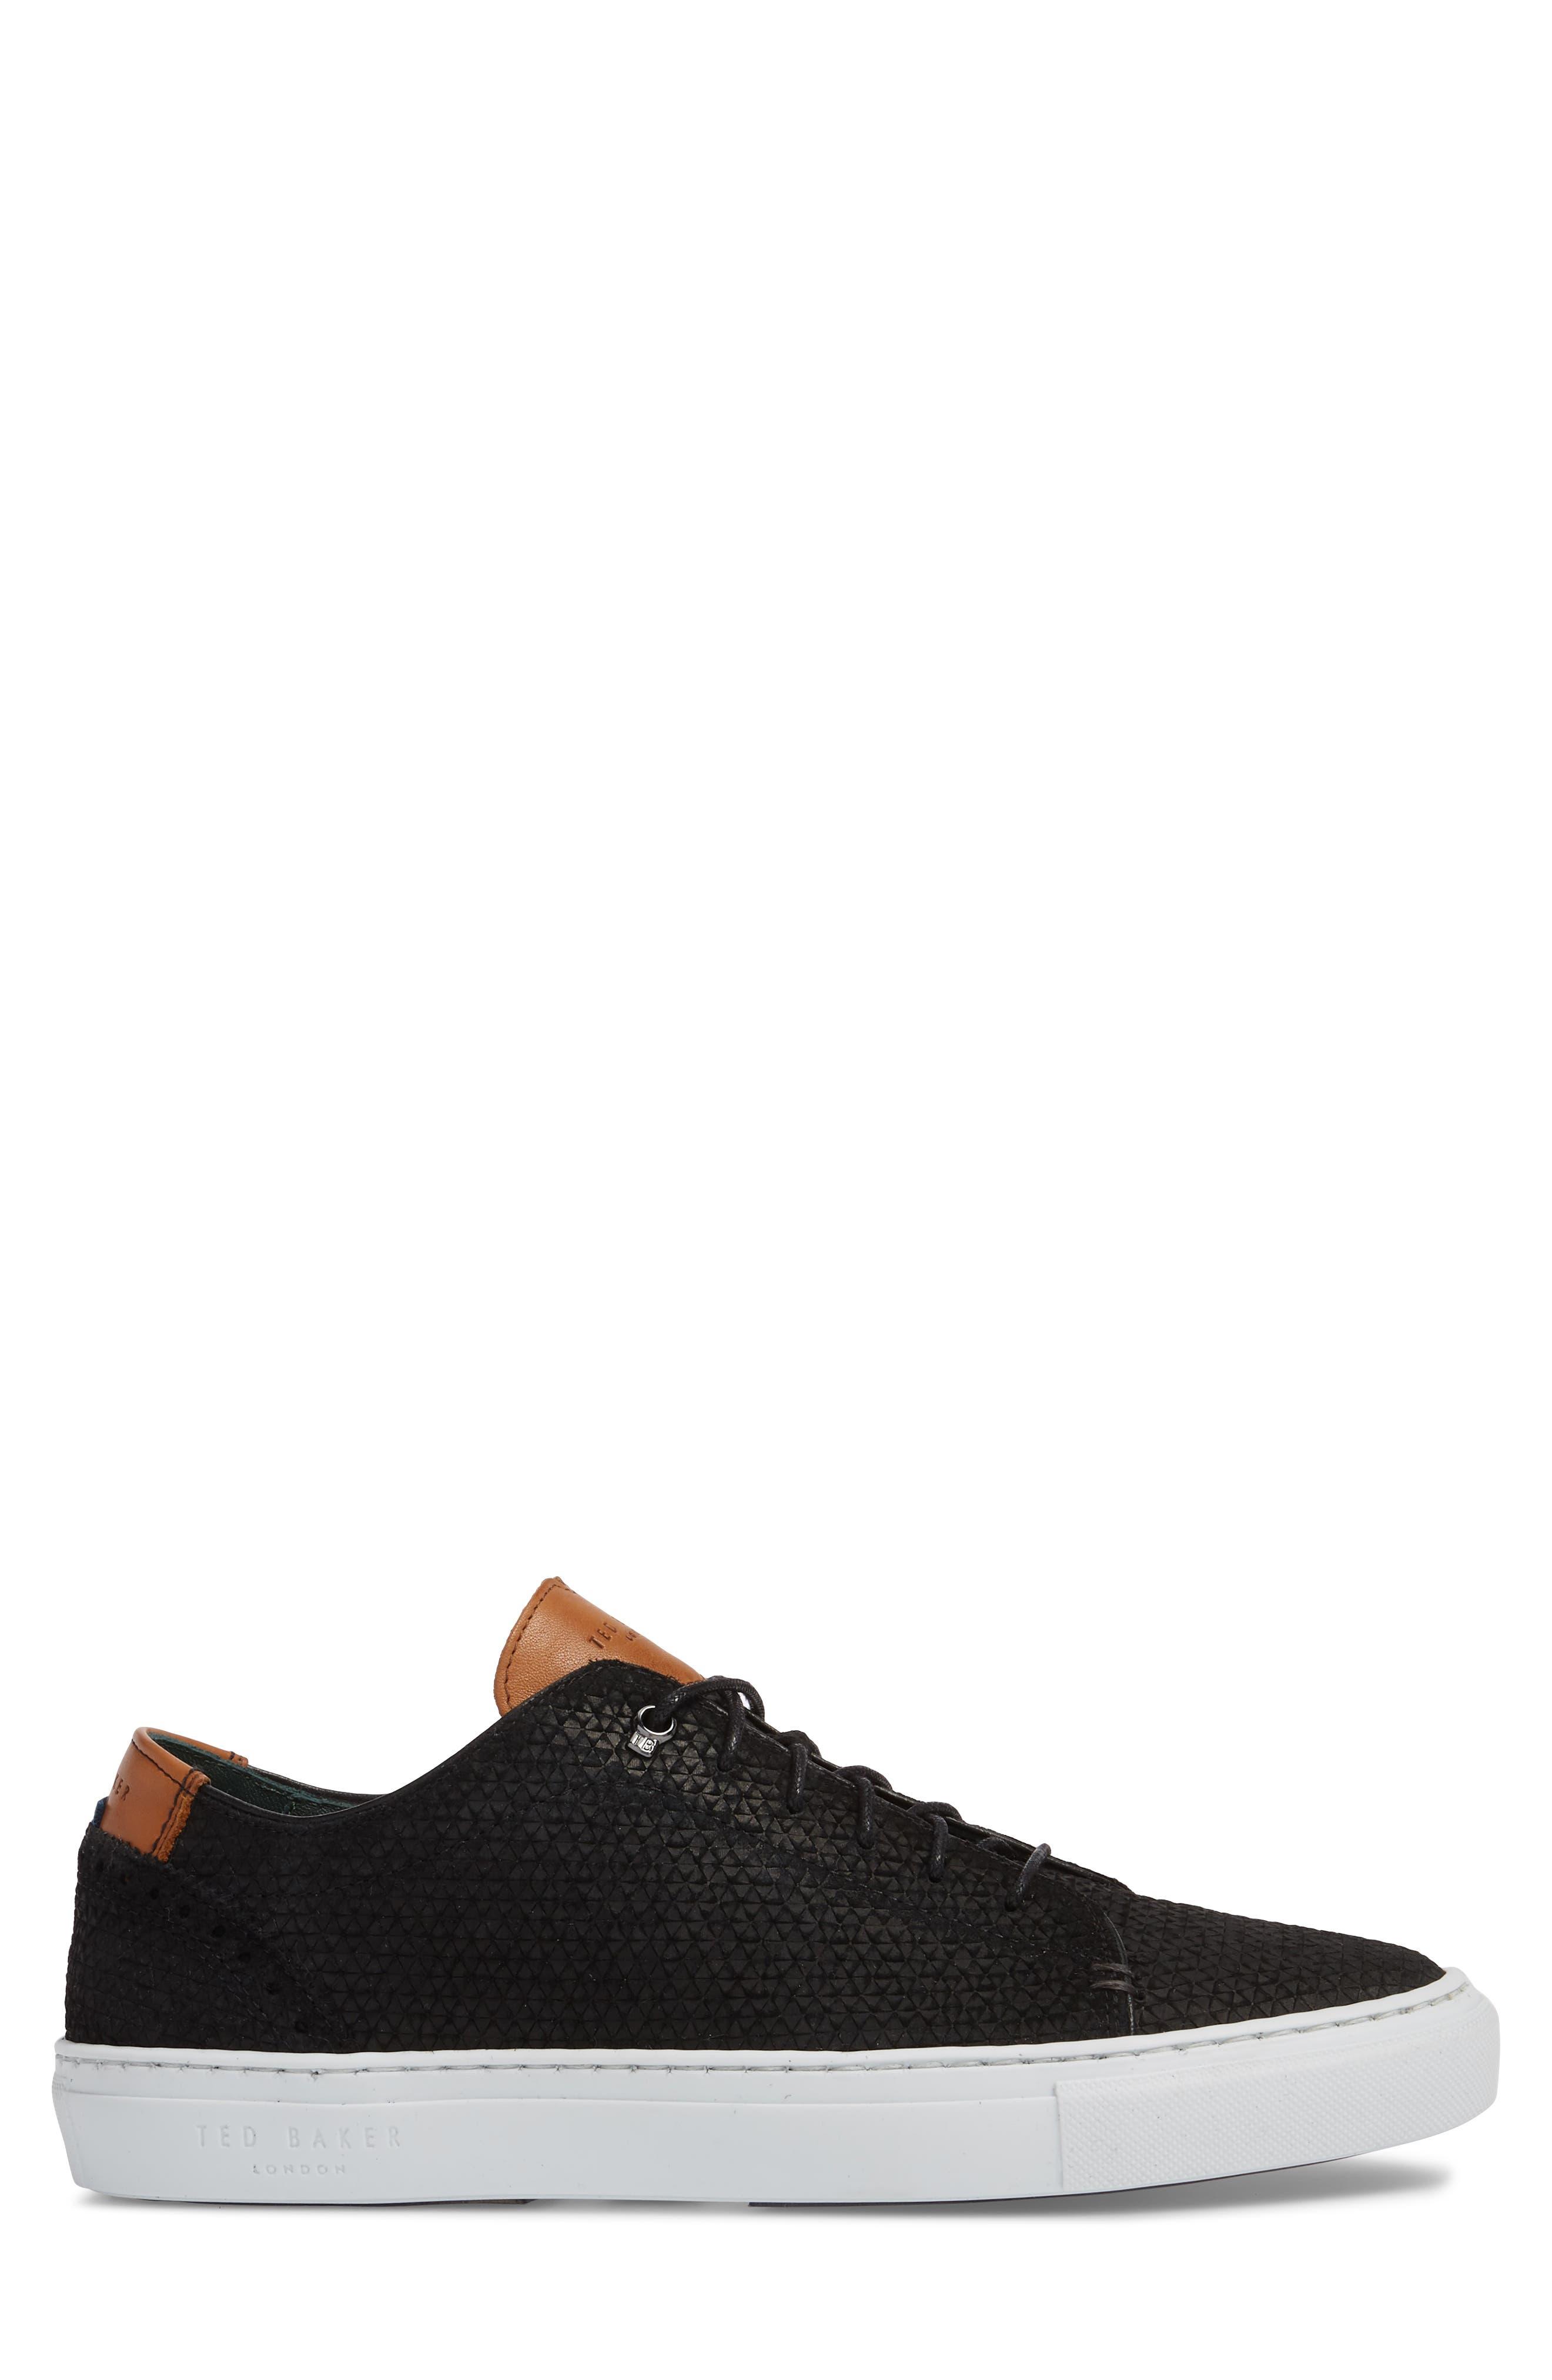 TED BAKER LONDON,                             Duukes Embossed Low Top Sneaker,                             Alternate thumbnail 3, color,                             010